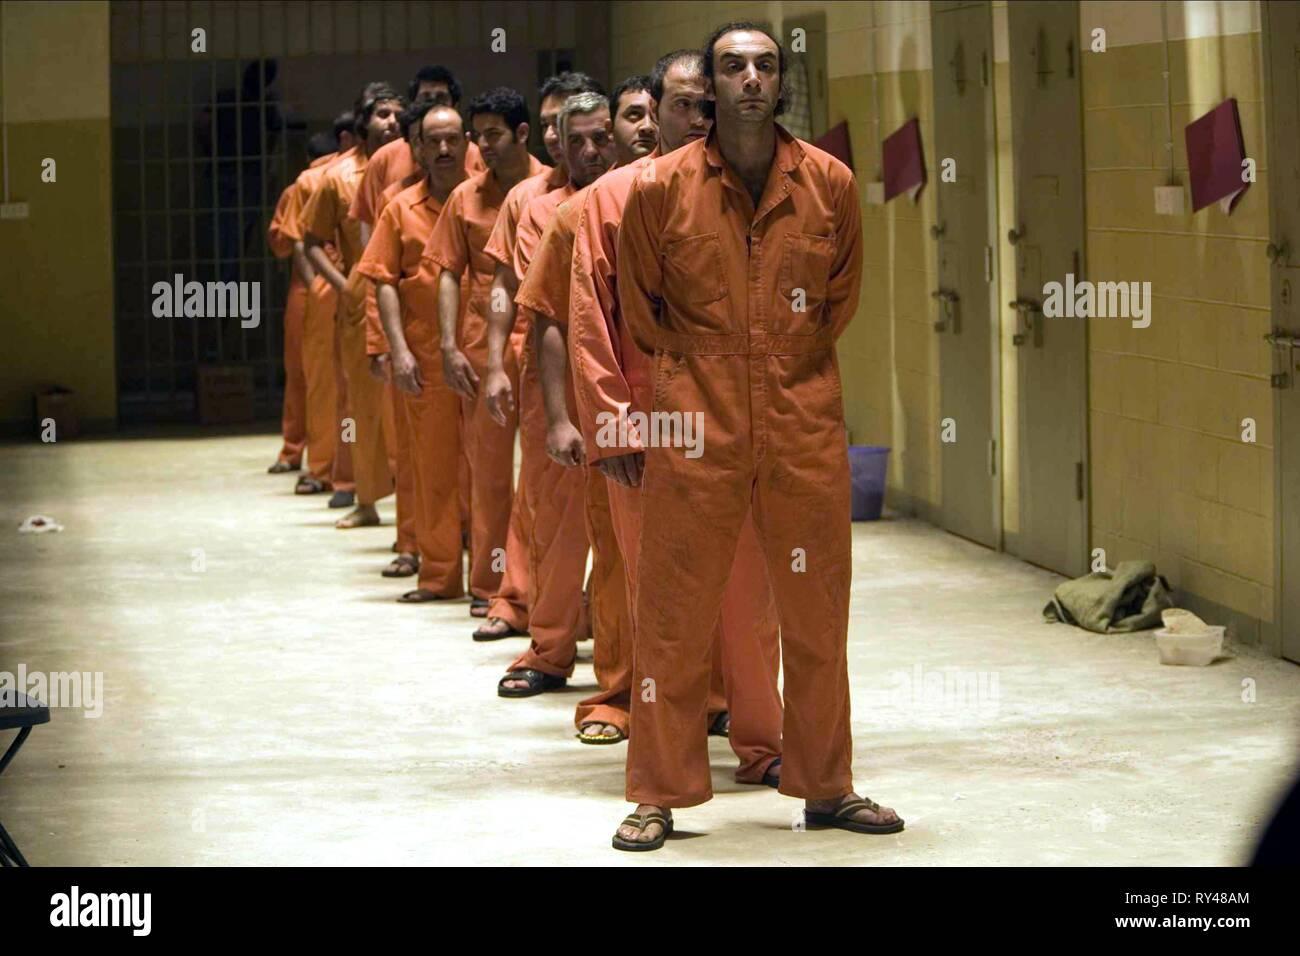 ABU GHRAIB IRAQI PRISON INMATES, STANDARD OPERATING PROCEDURE, 2008 - Stock Image